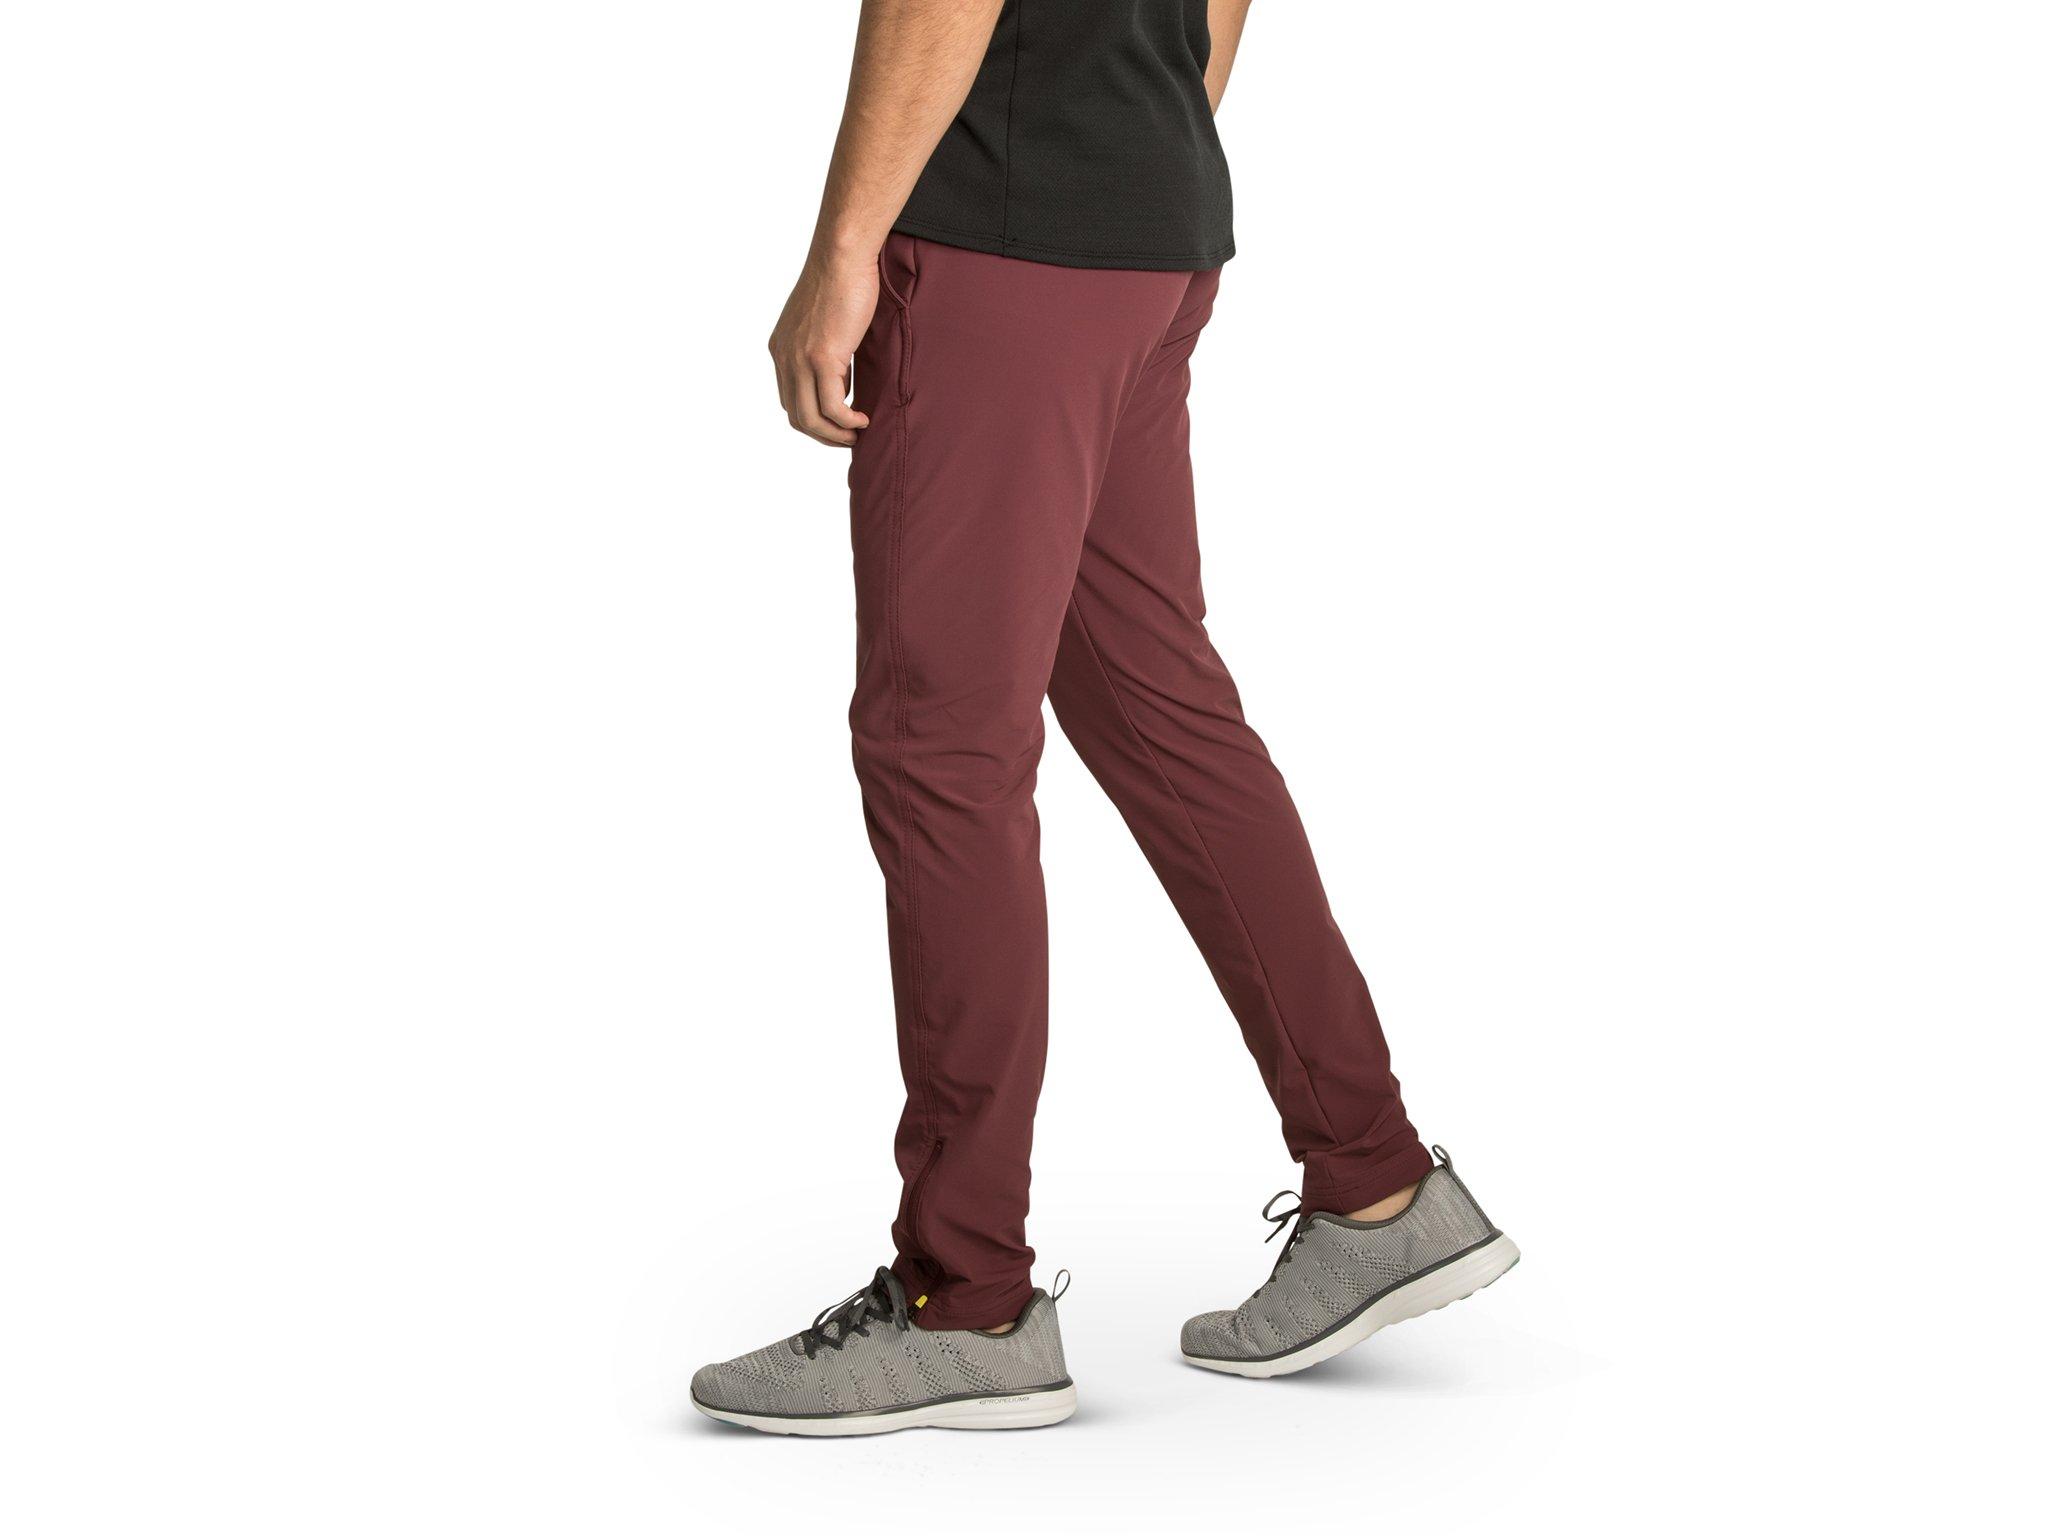 OLIVERS Apparel, Water Repellant, Athletic Cut, 4-Way Stretch, Bradbury Jogger Pants, 31 Inch Inseam - Crimson - Large